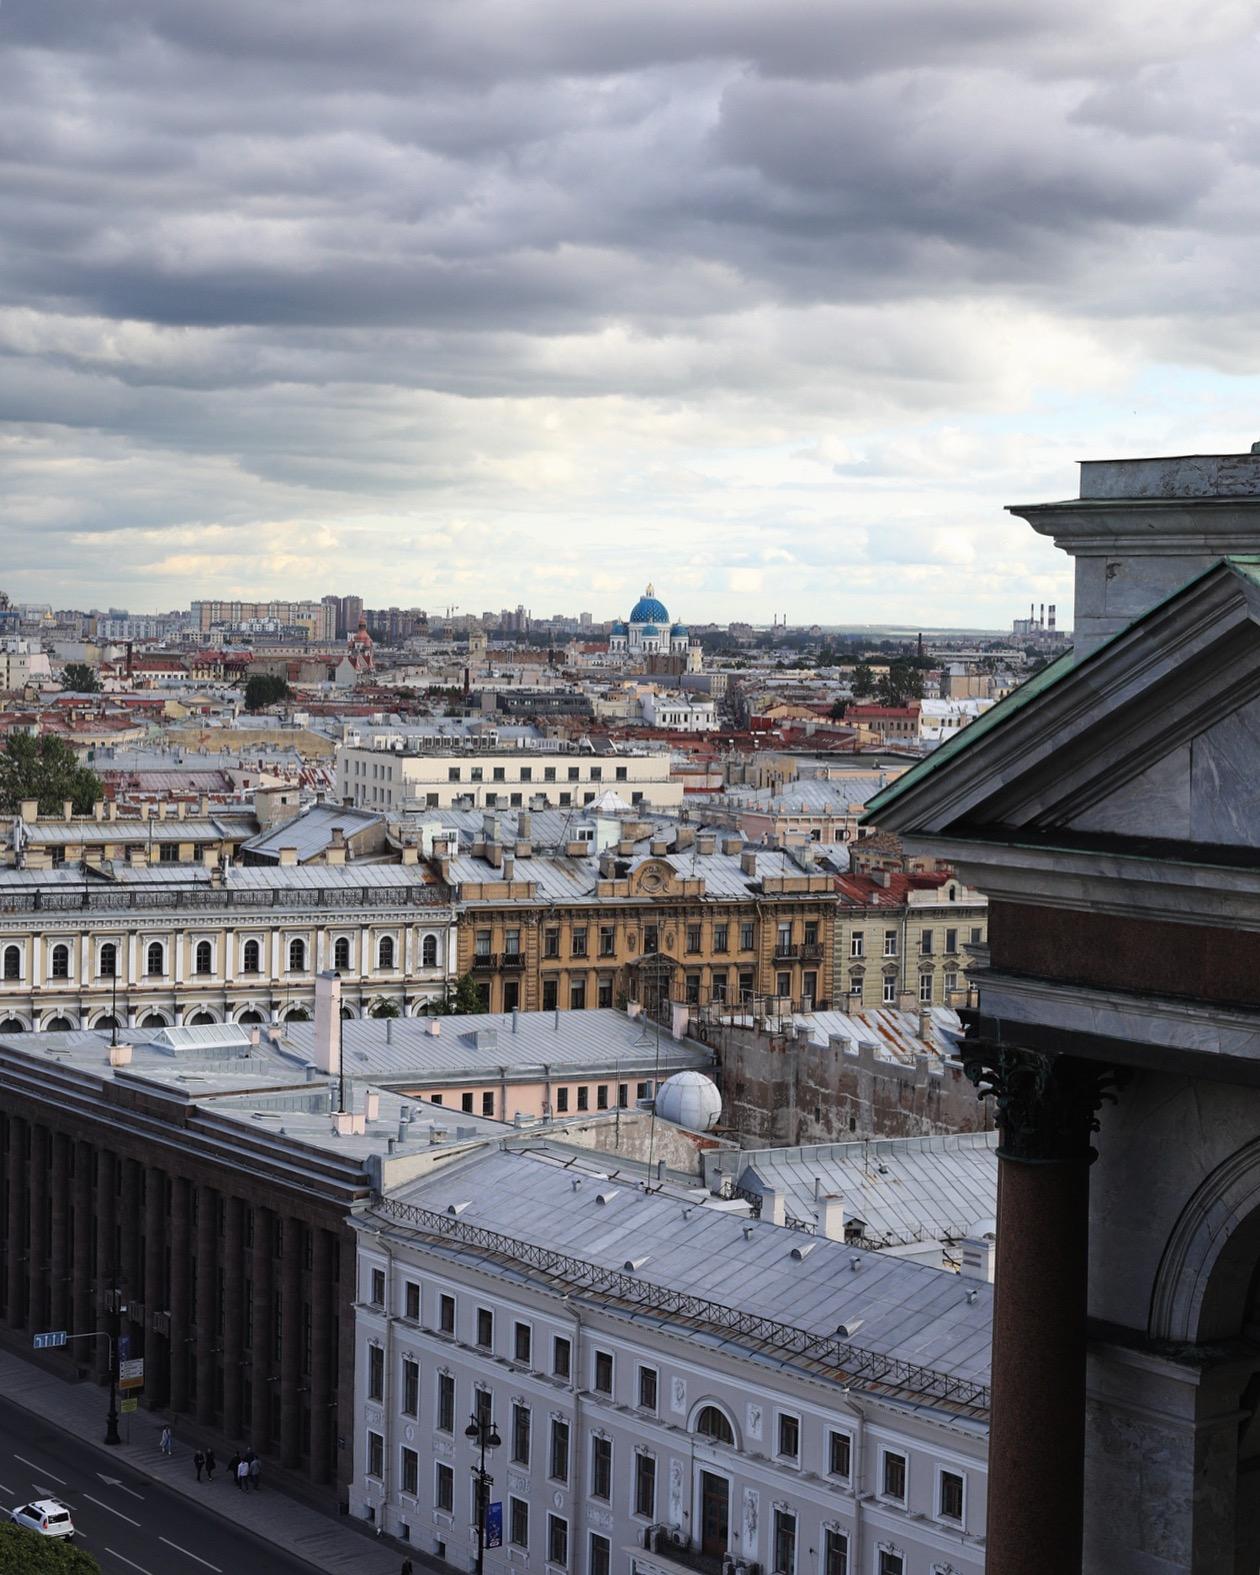 Питер, как на ладони... . Блиц: Санкт-Петербург